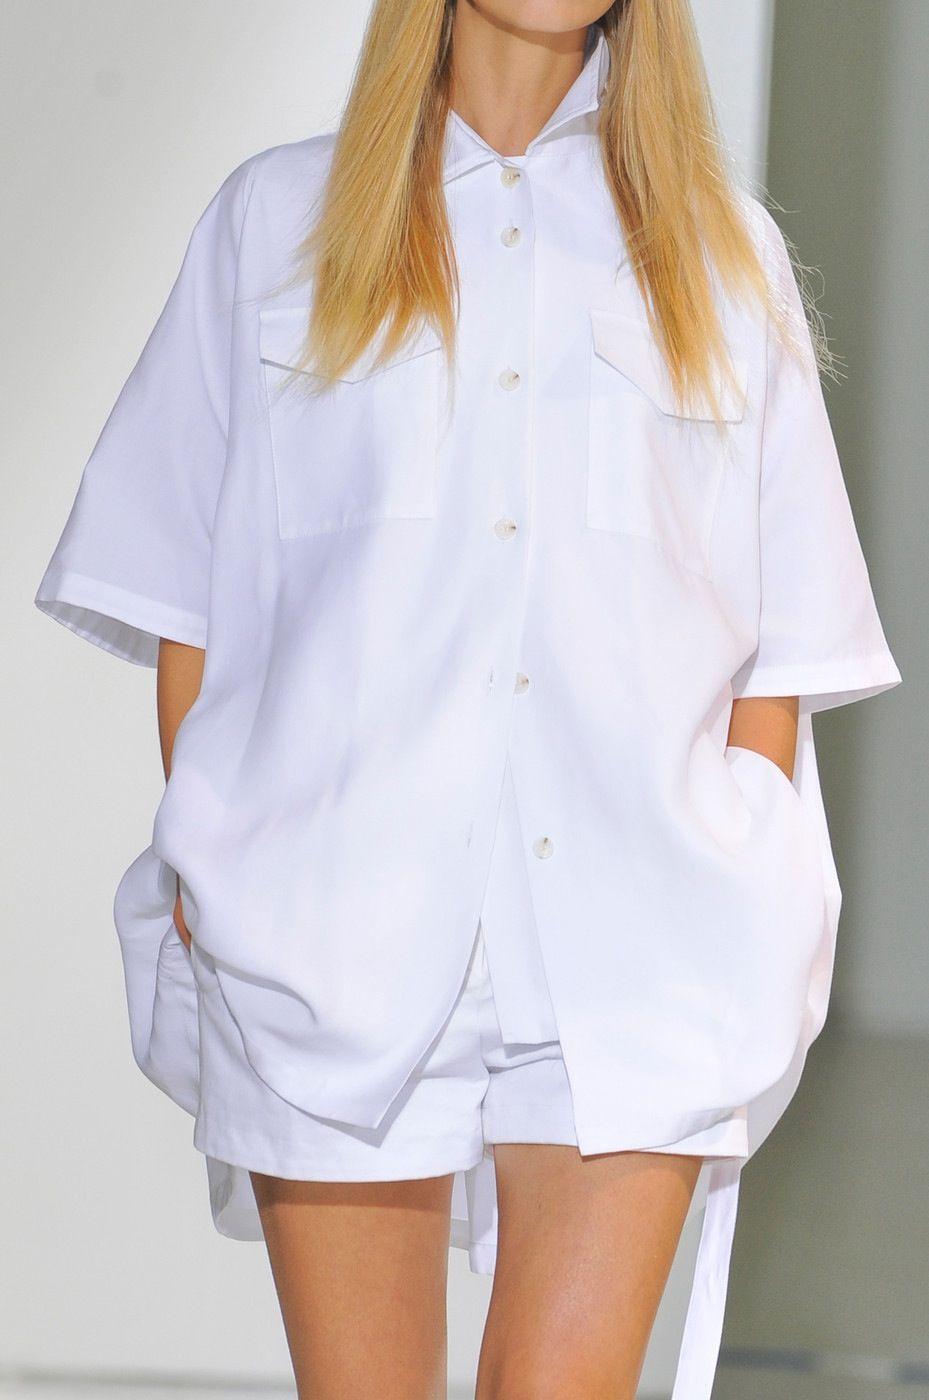 oversized shirt @ yang li spring 14